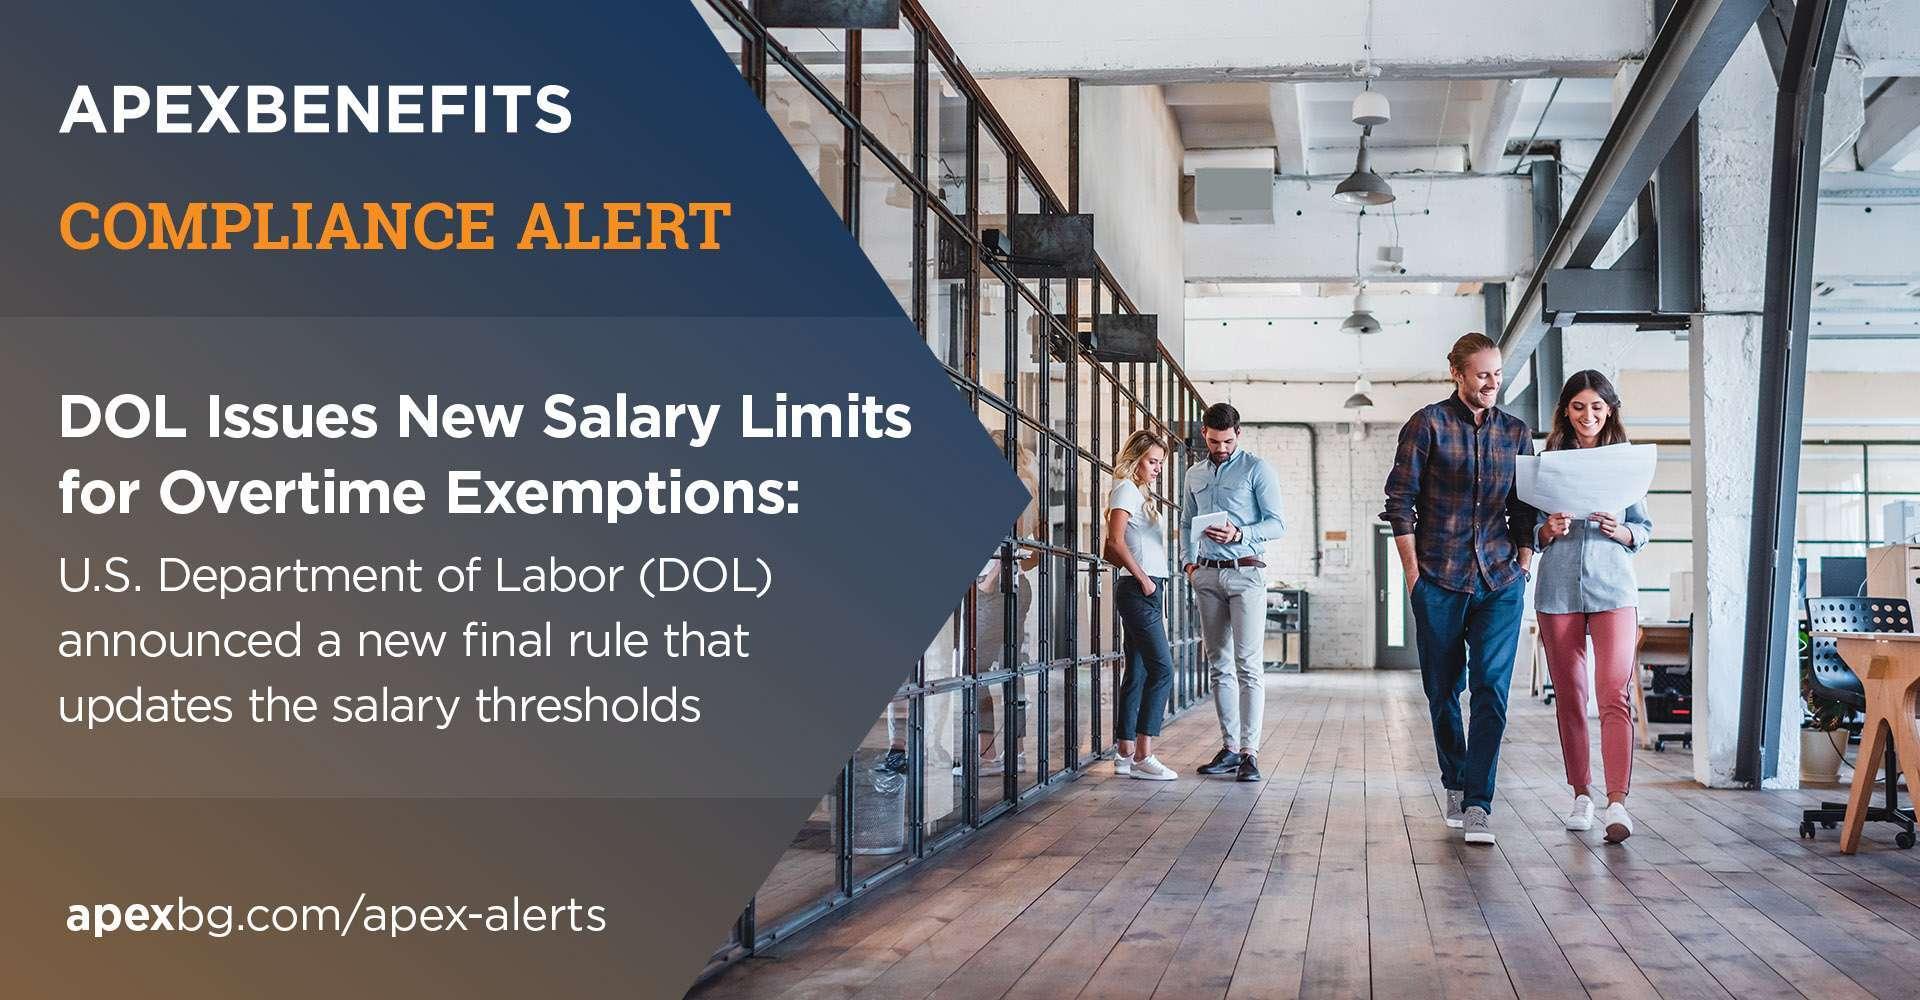 Compliance Alert - Overtime Exemptions